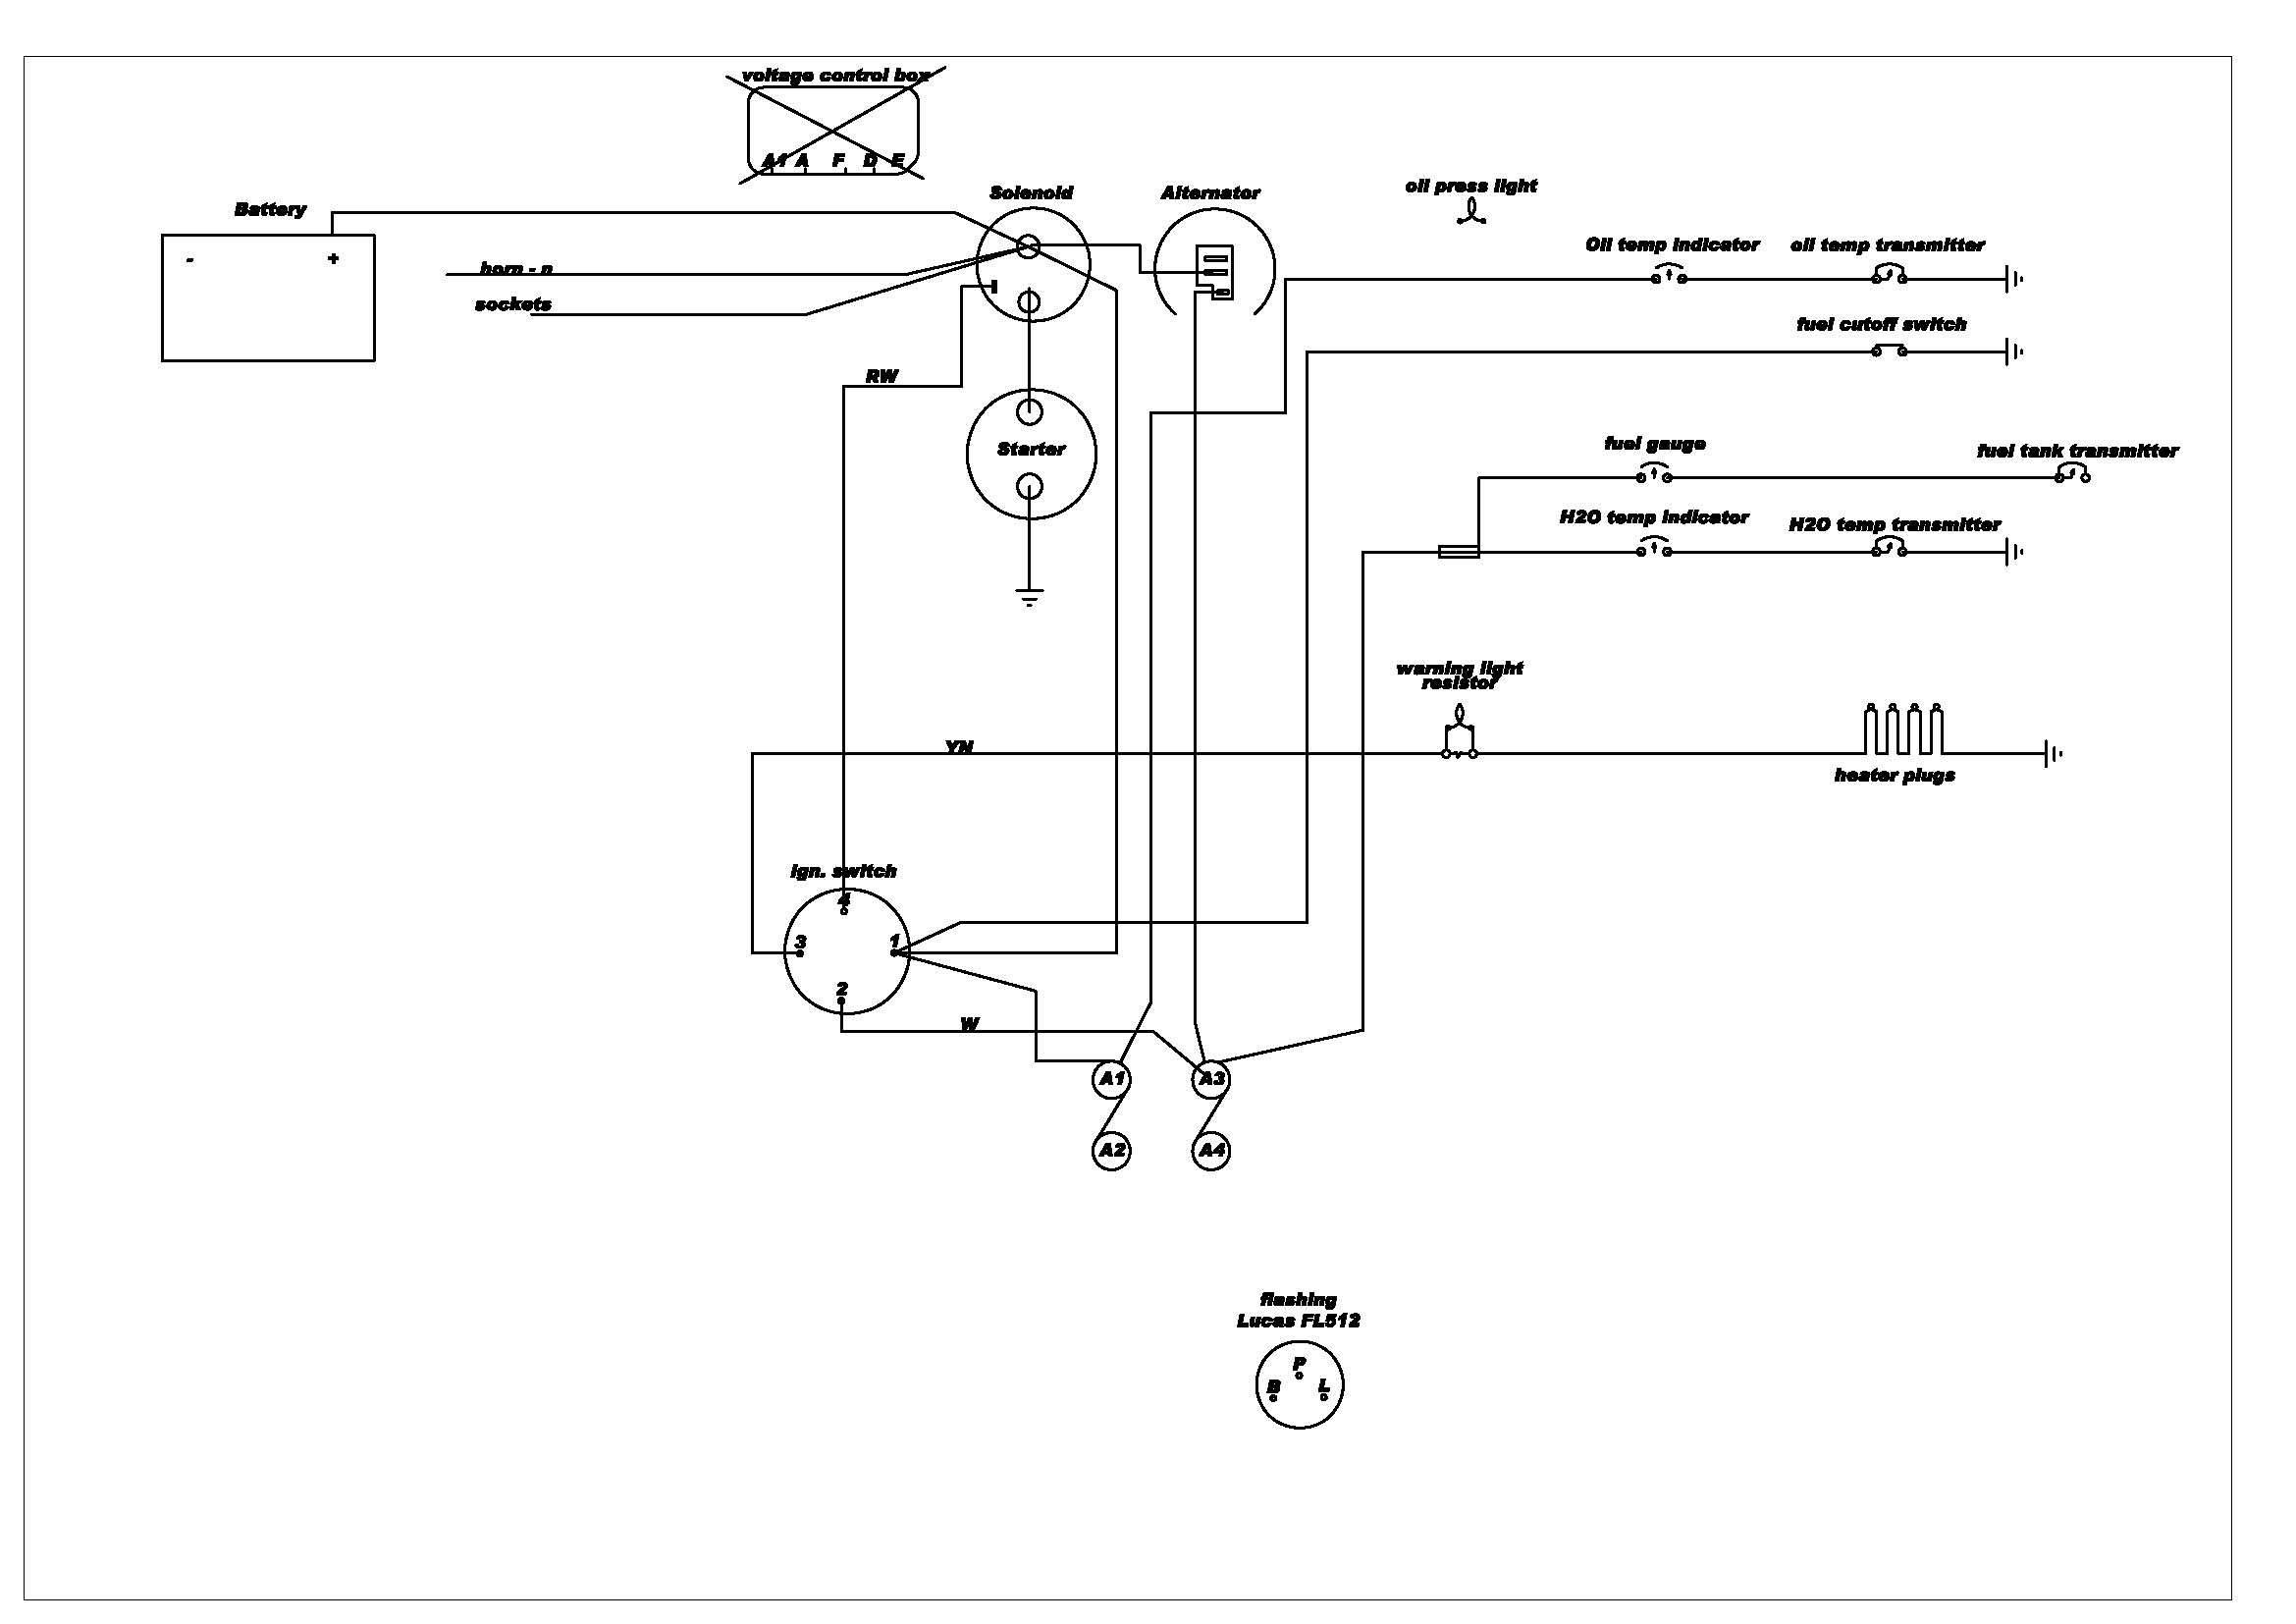 land rover wiring diagram key xf 5710  land rover series 3 alternator wiring diagram download  land rover series 3 alternator wiring